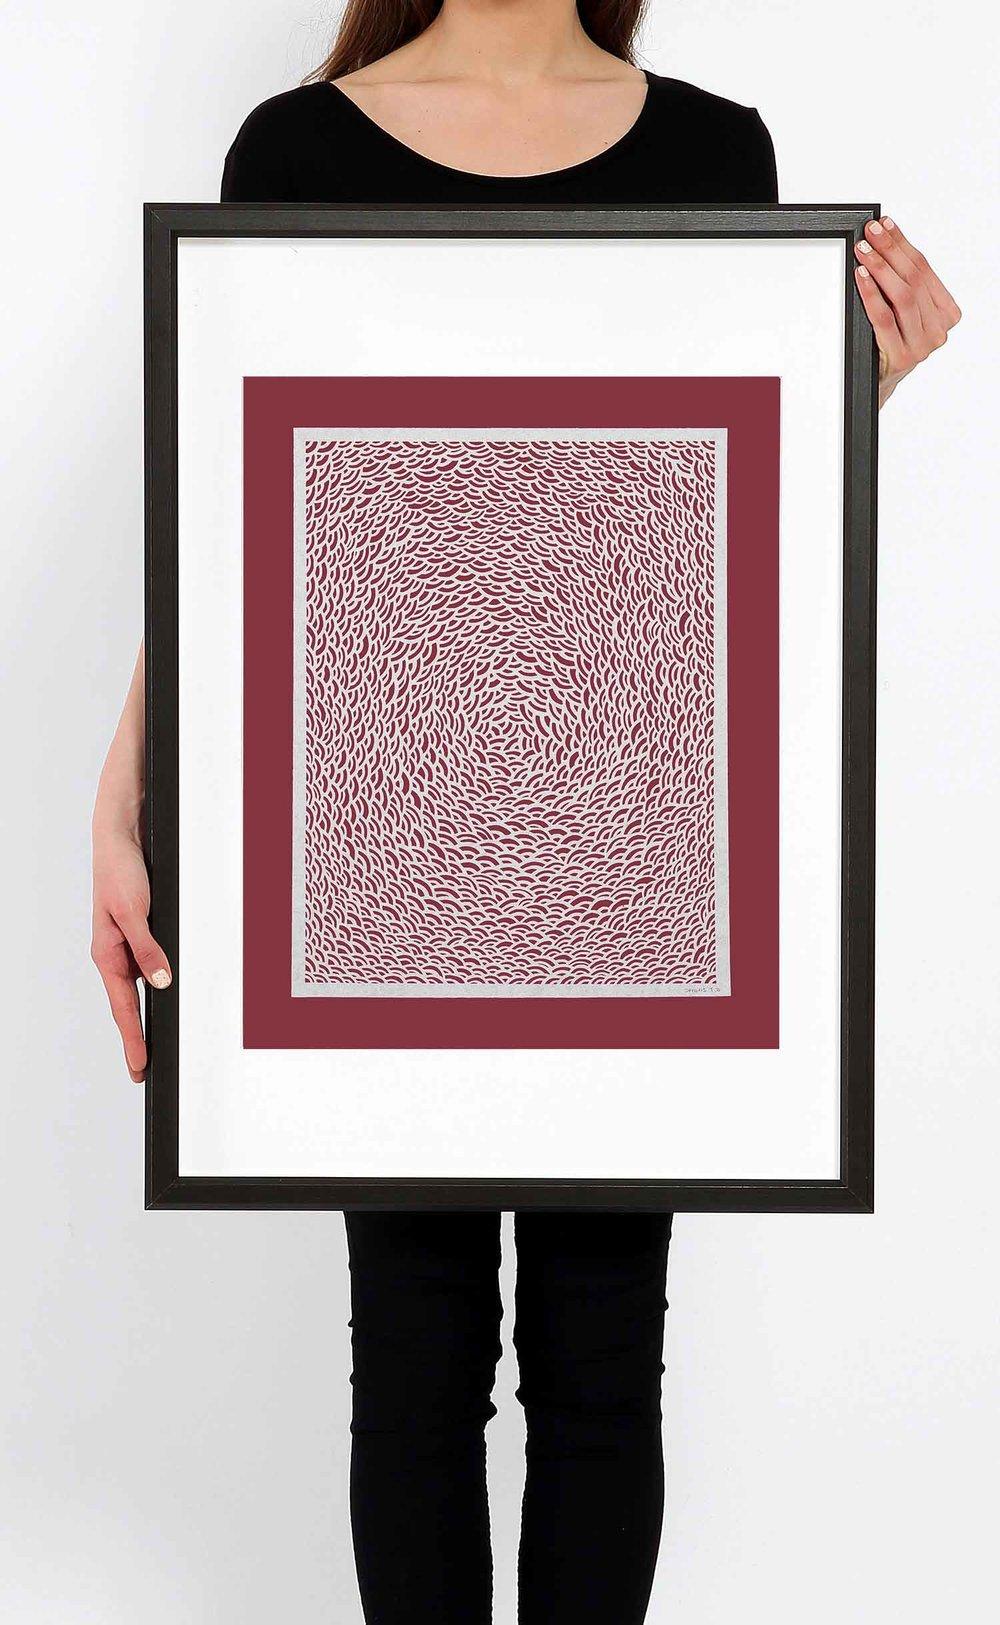 stratis_tavlaridis_untitled_white arcs_large_on_red_framed.jpg